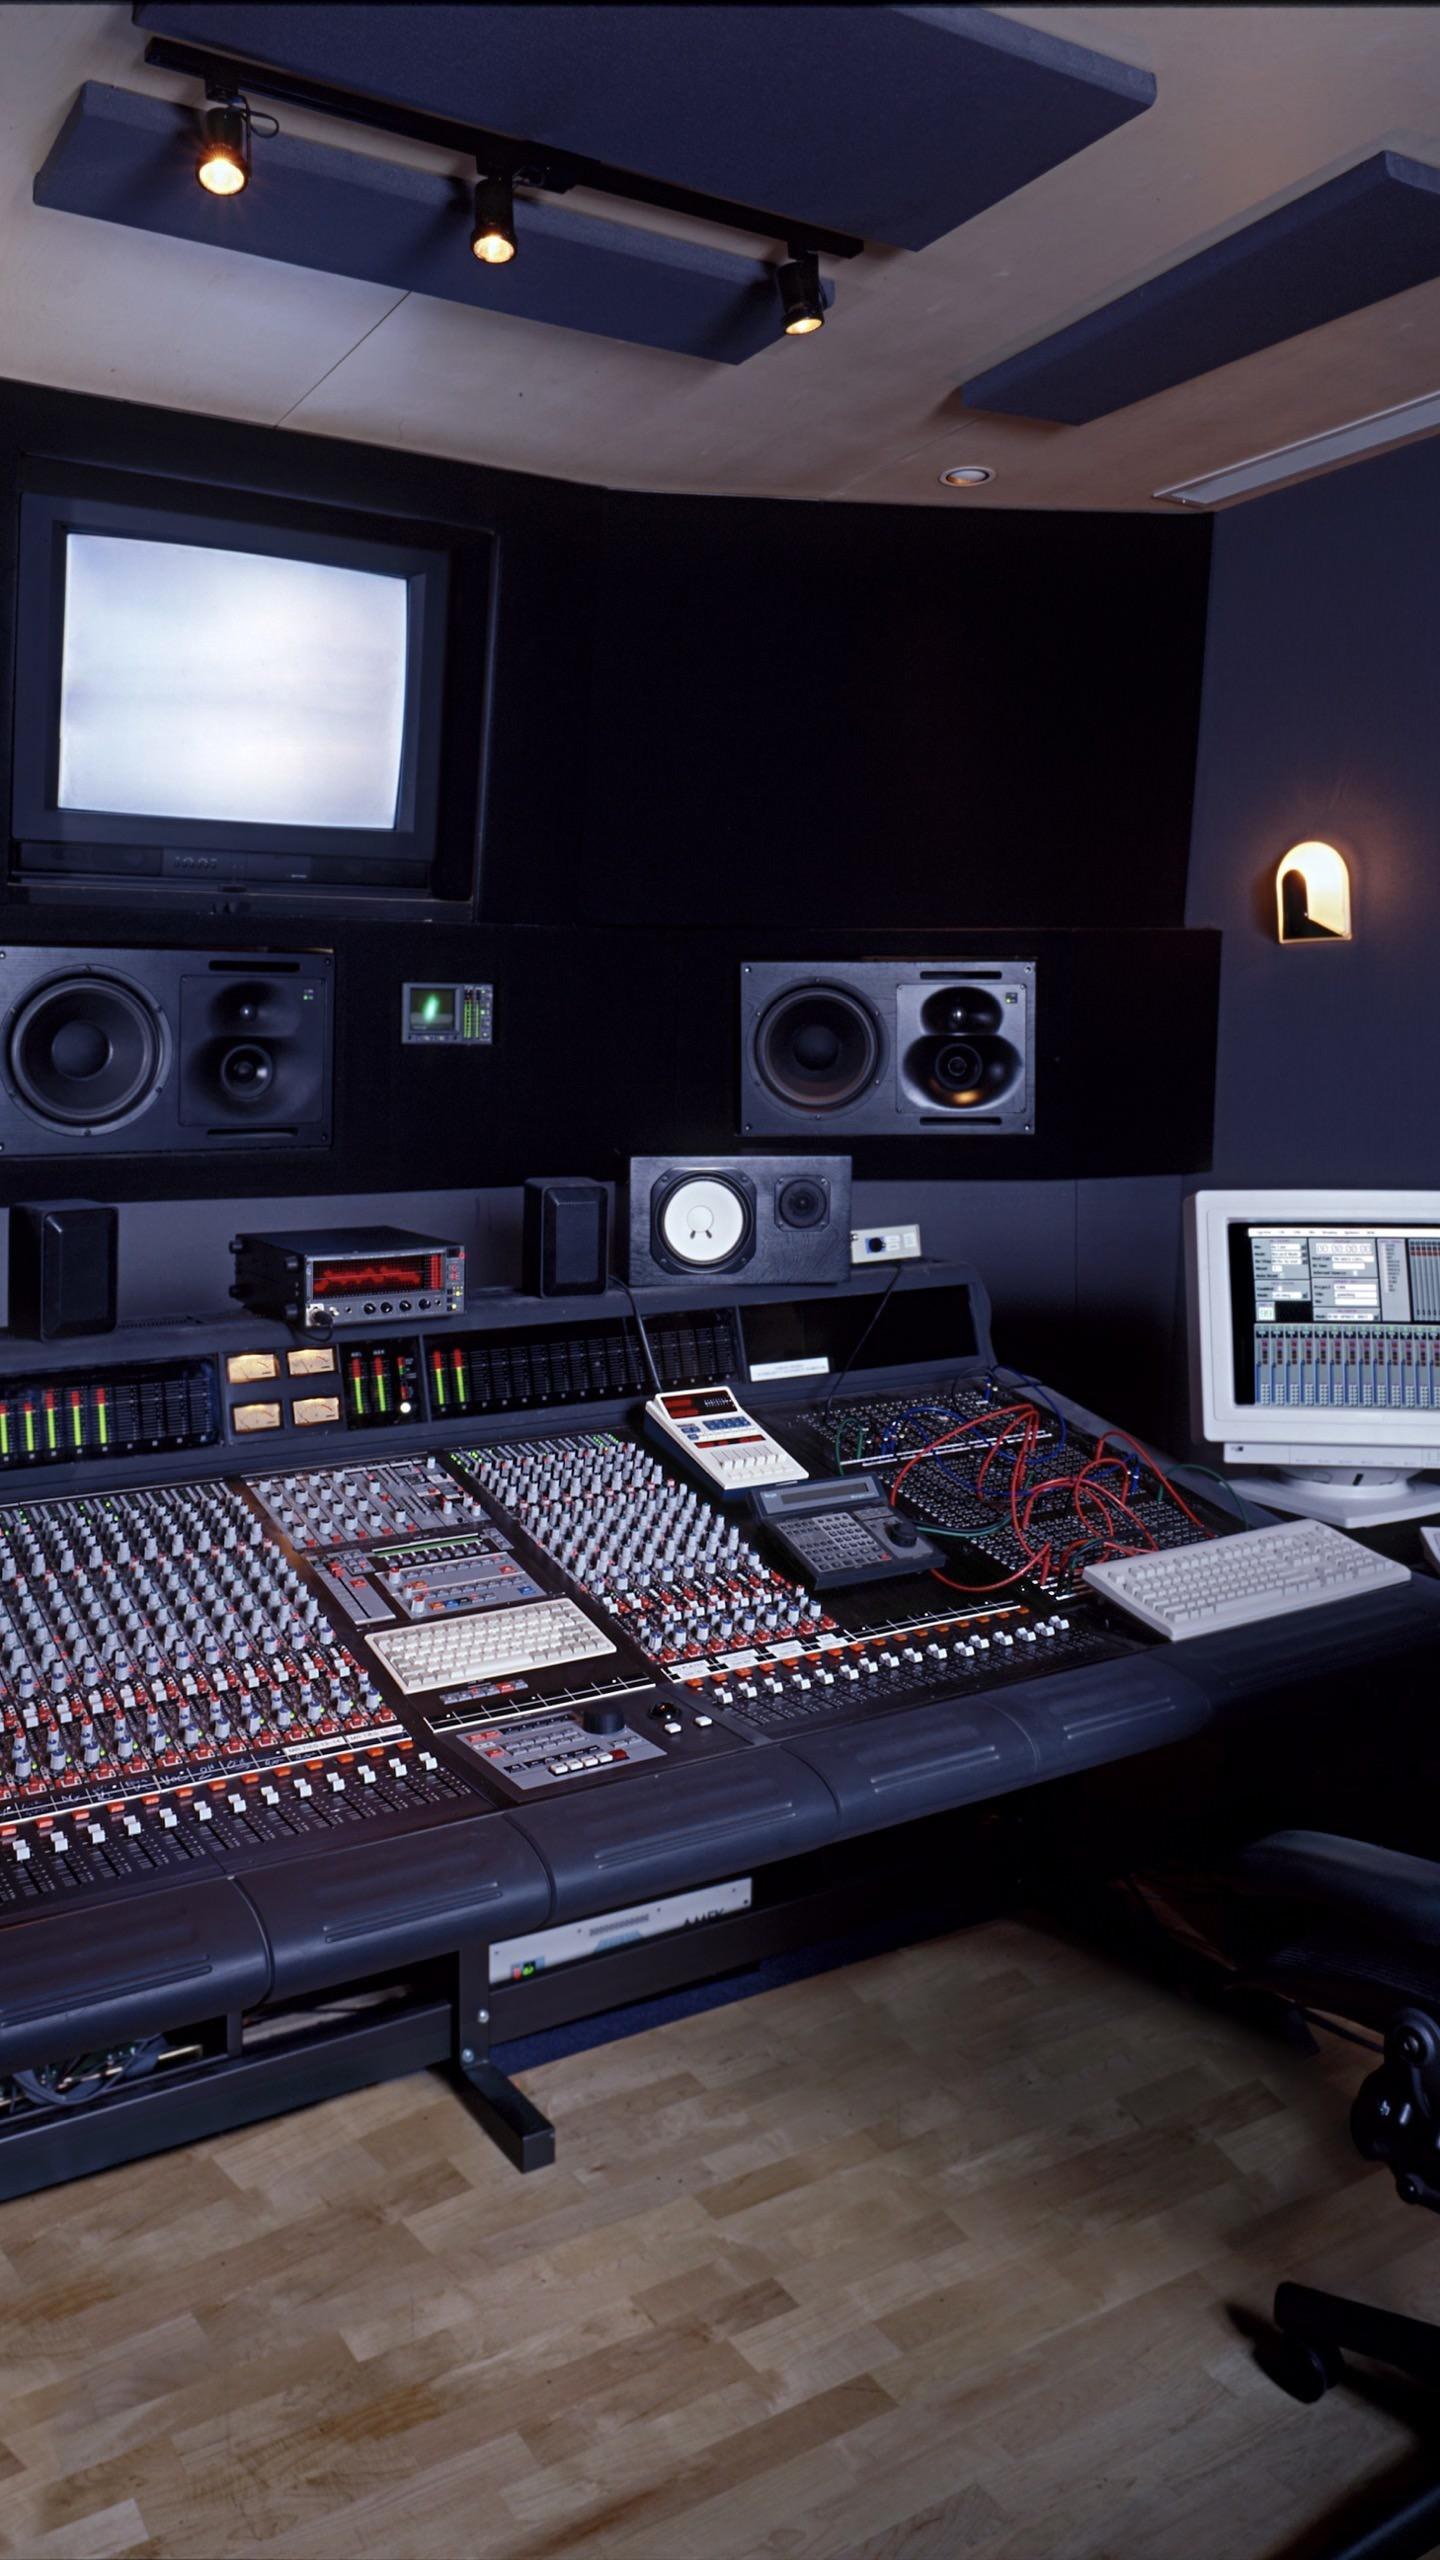 Studio To Go Makeup Case With Light: Music Studio Wallpaper (62+ Images